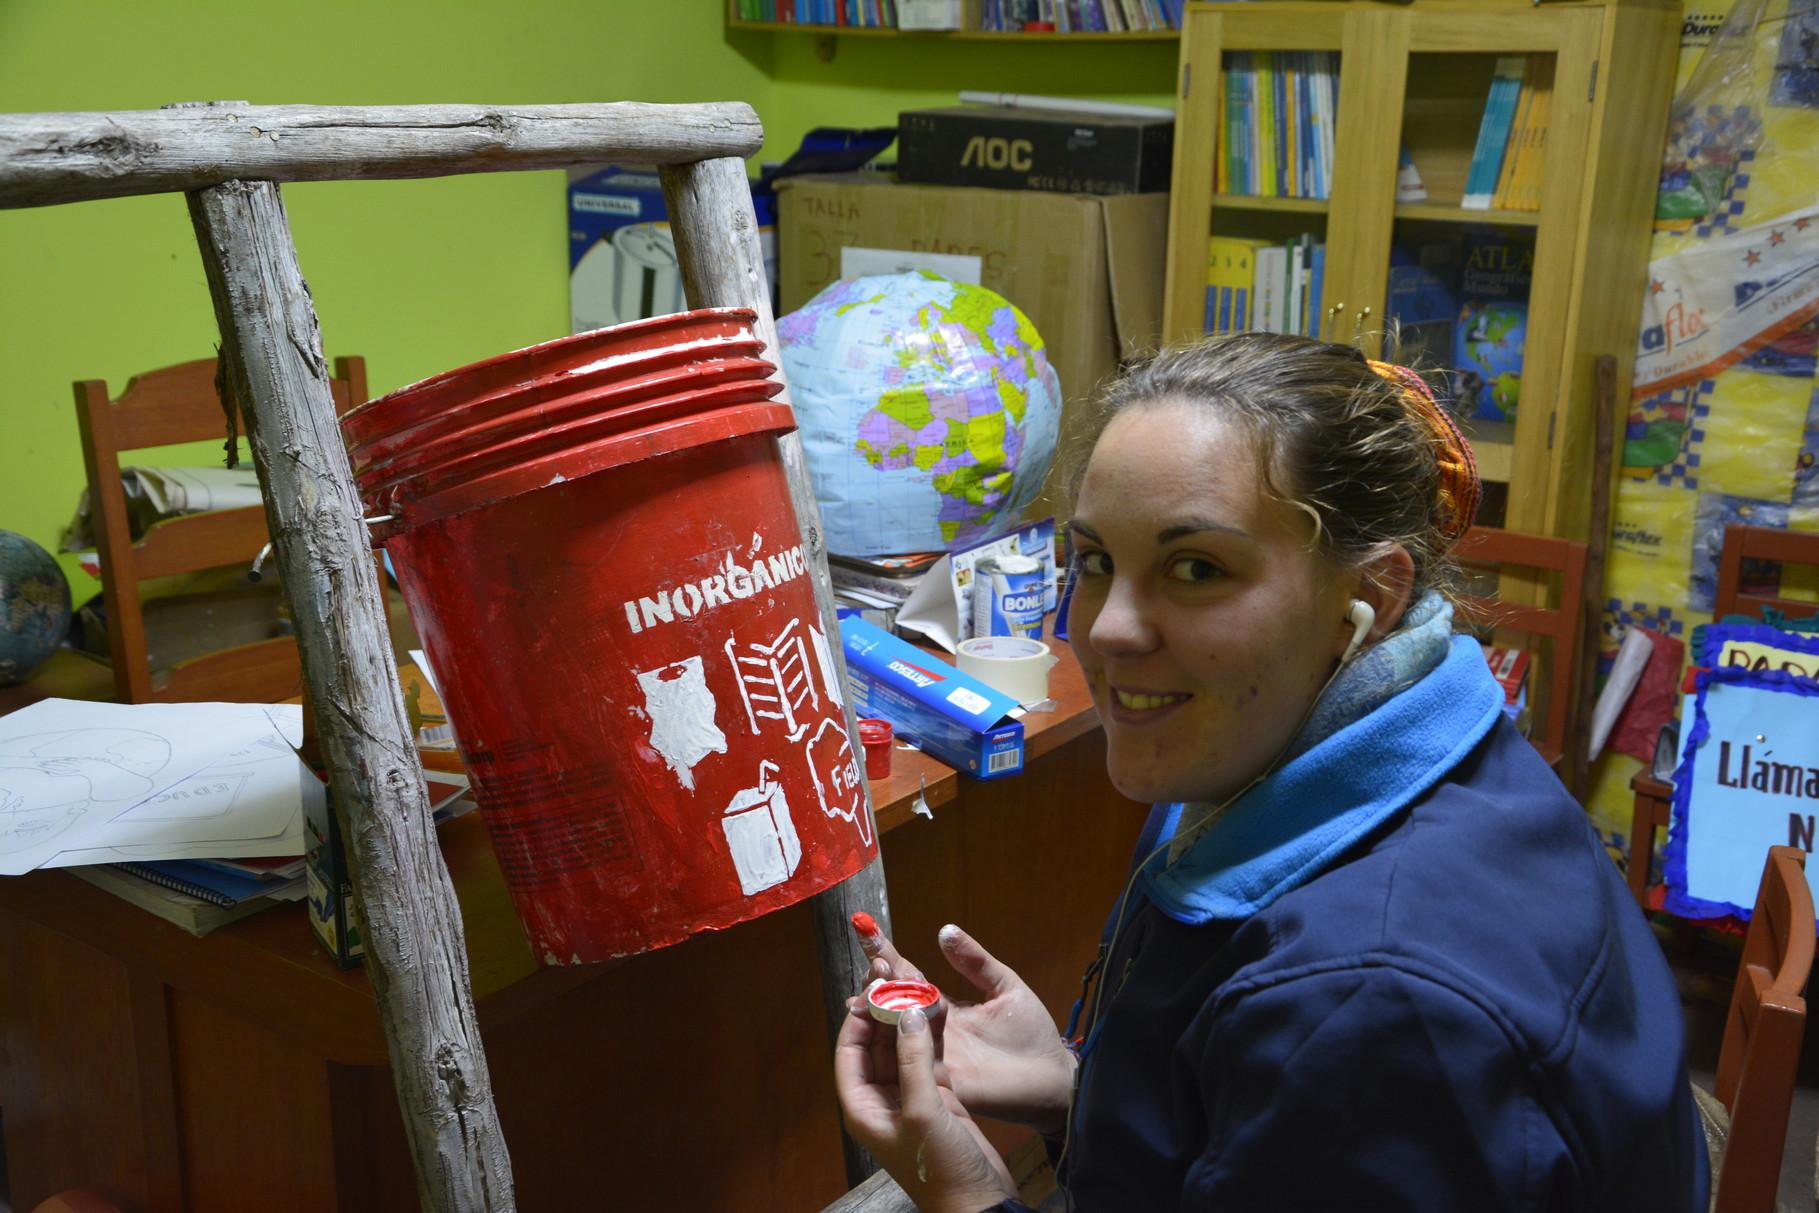 14 Mayo - Elaborando un tacho para residuos inorgánicos.